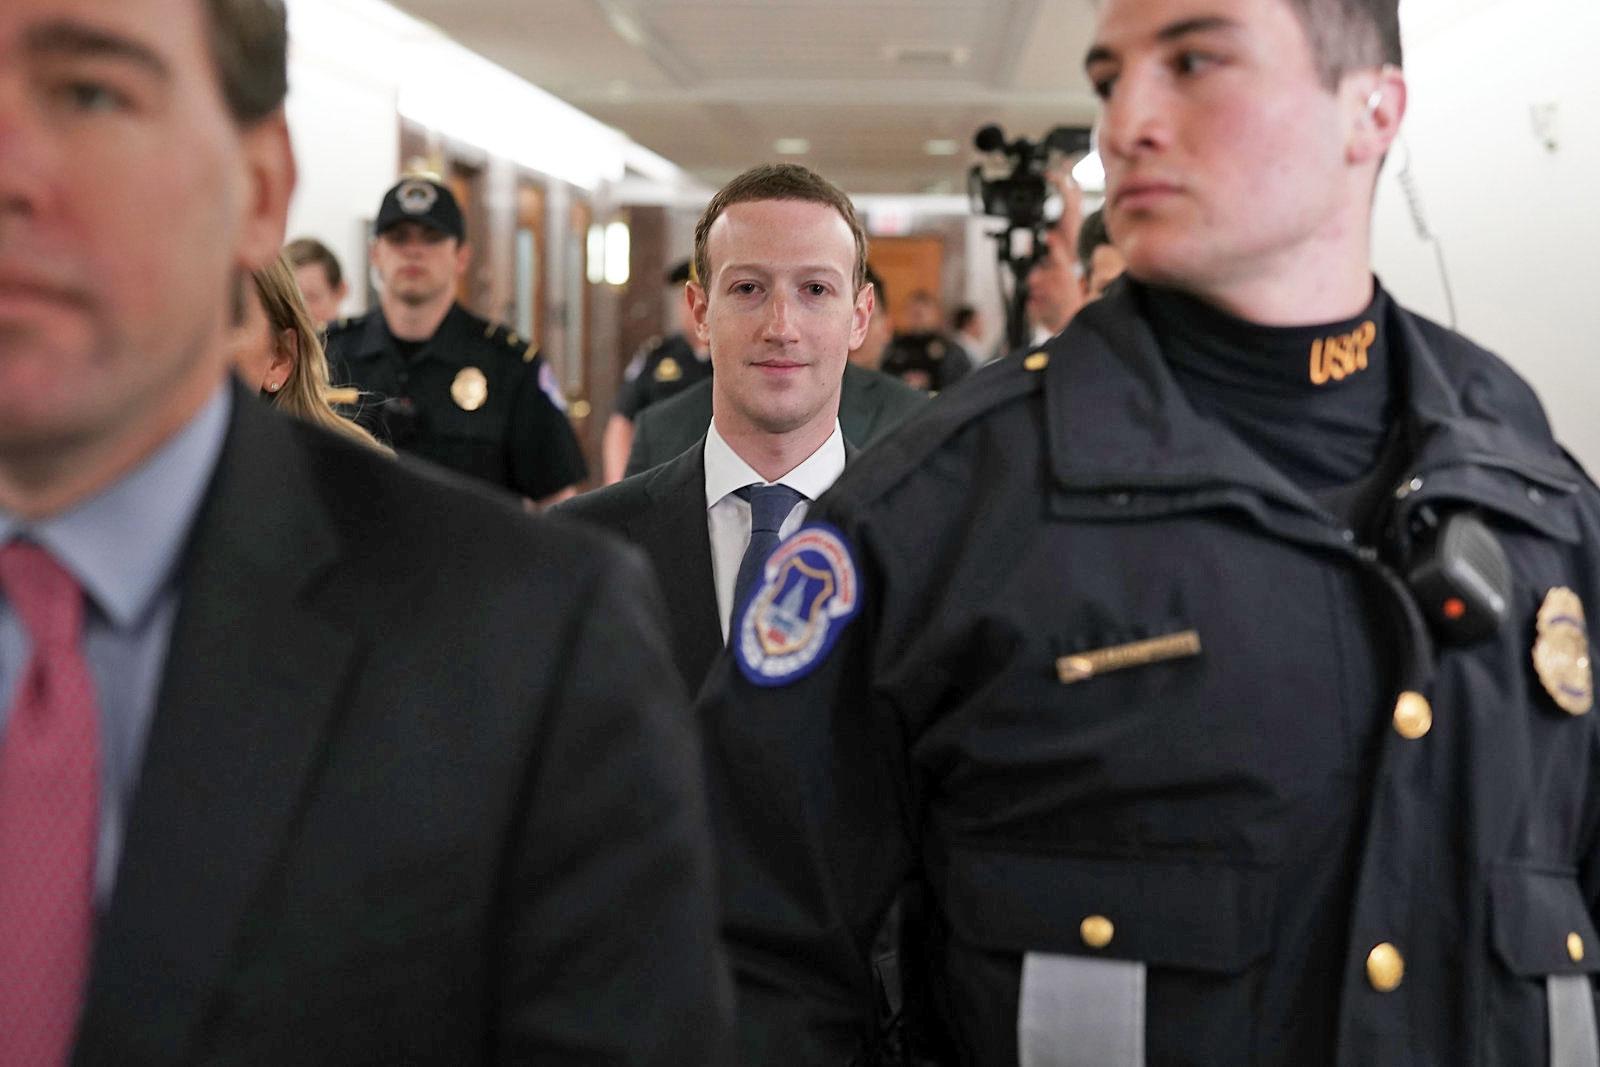 Hasil gambar untuk Zuckerberg: Facebook has a 200-person counterterrorism team / wapo / GIF